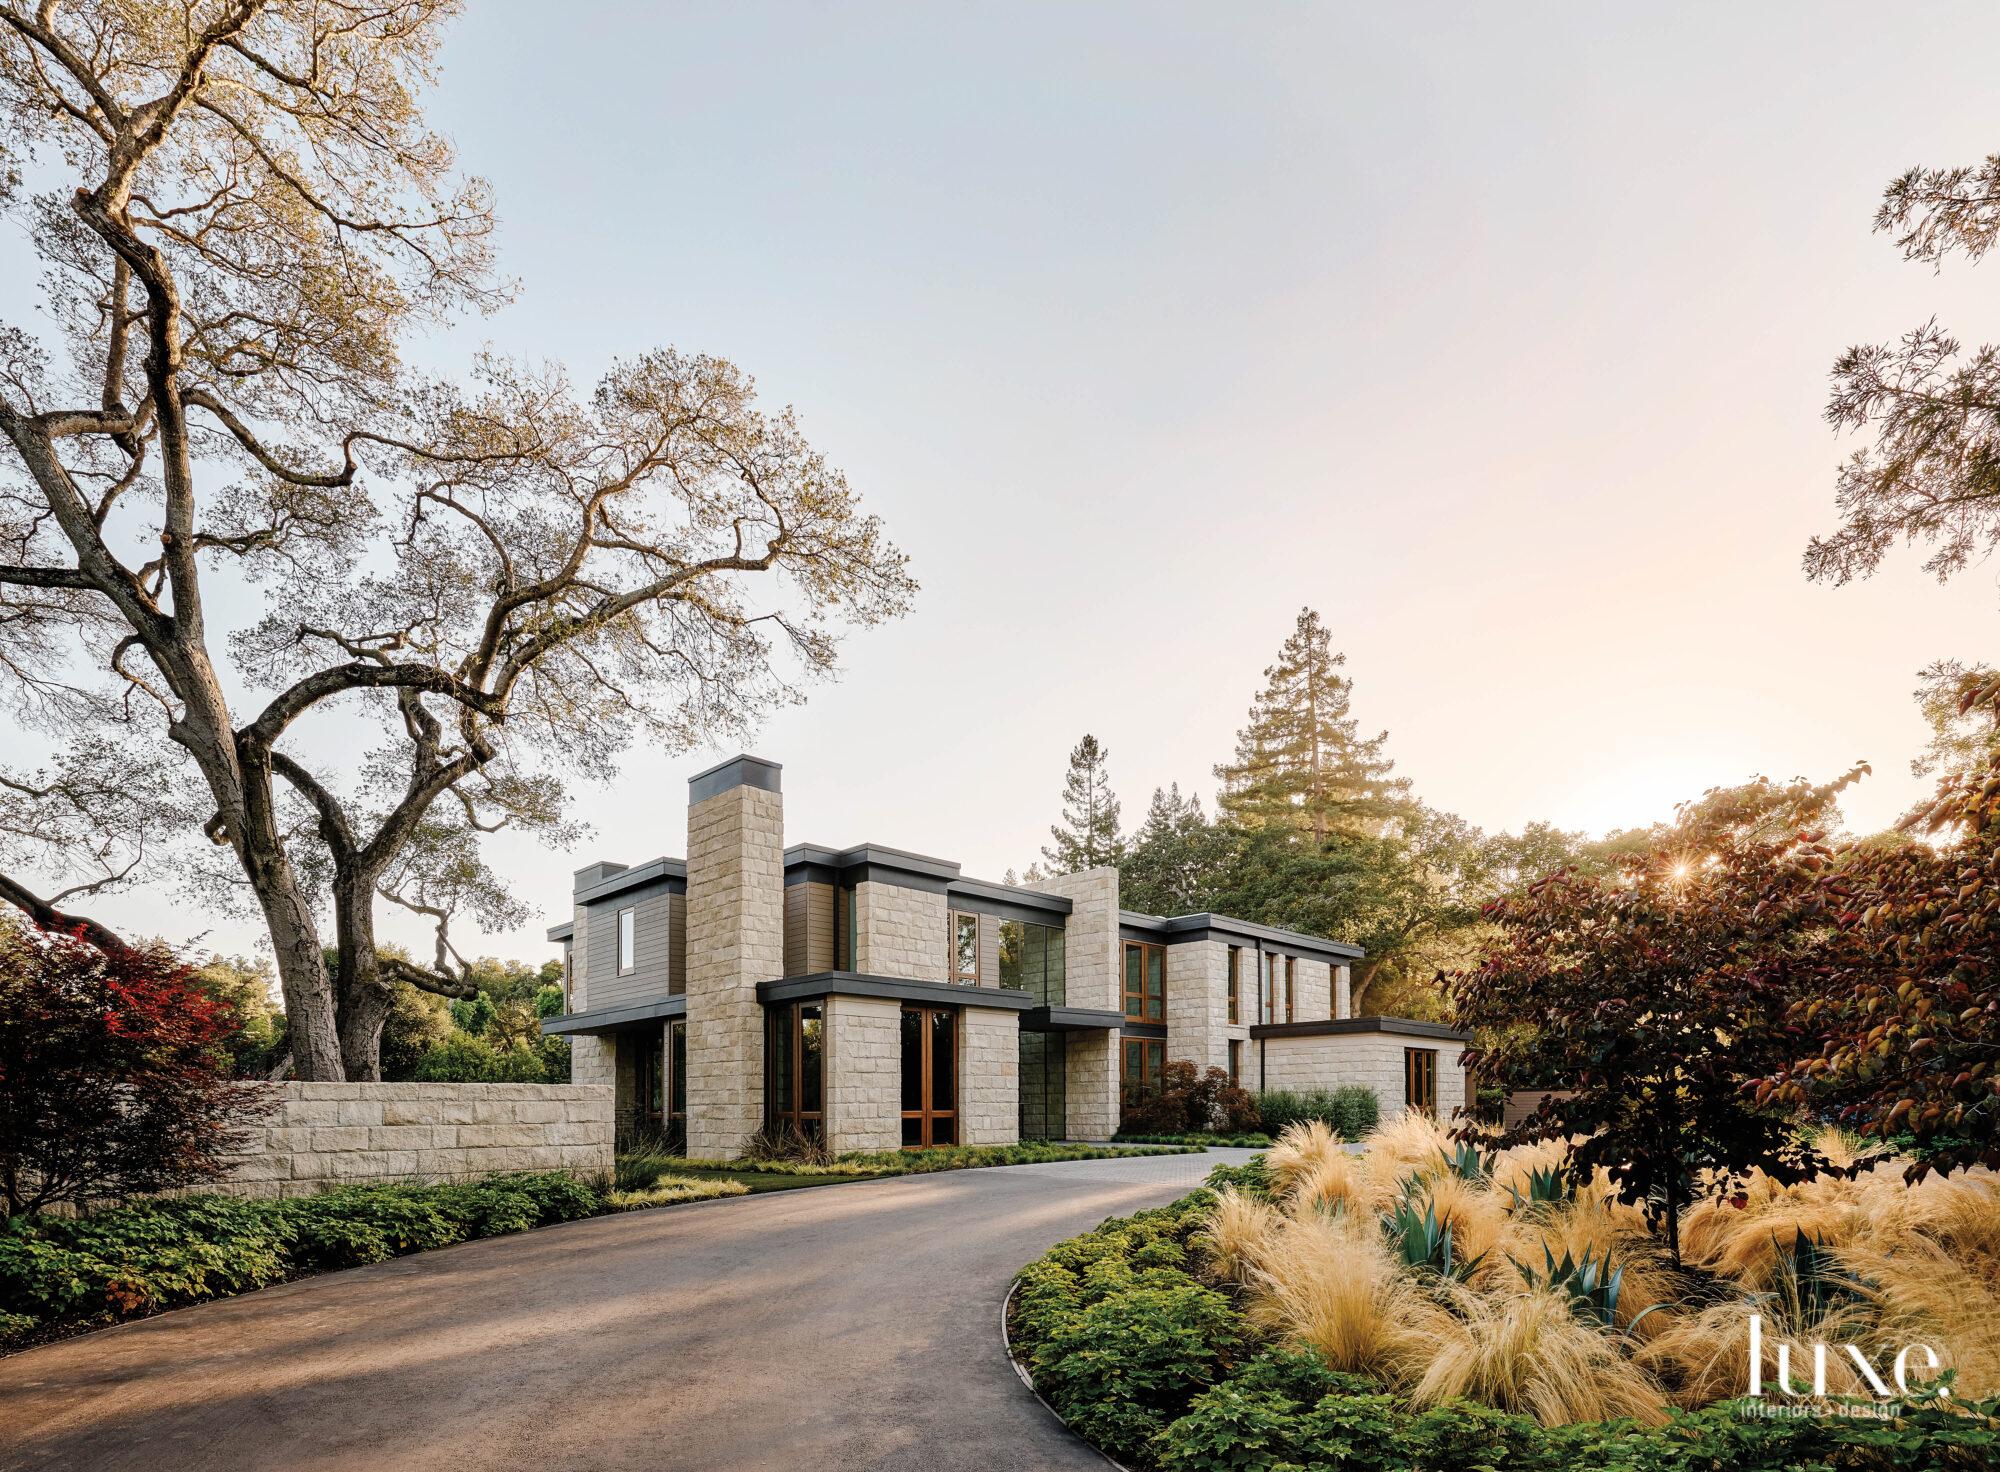 A modern house sits amidst...